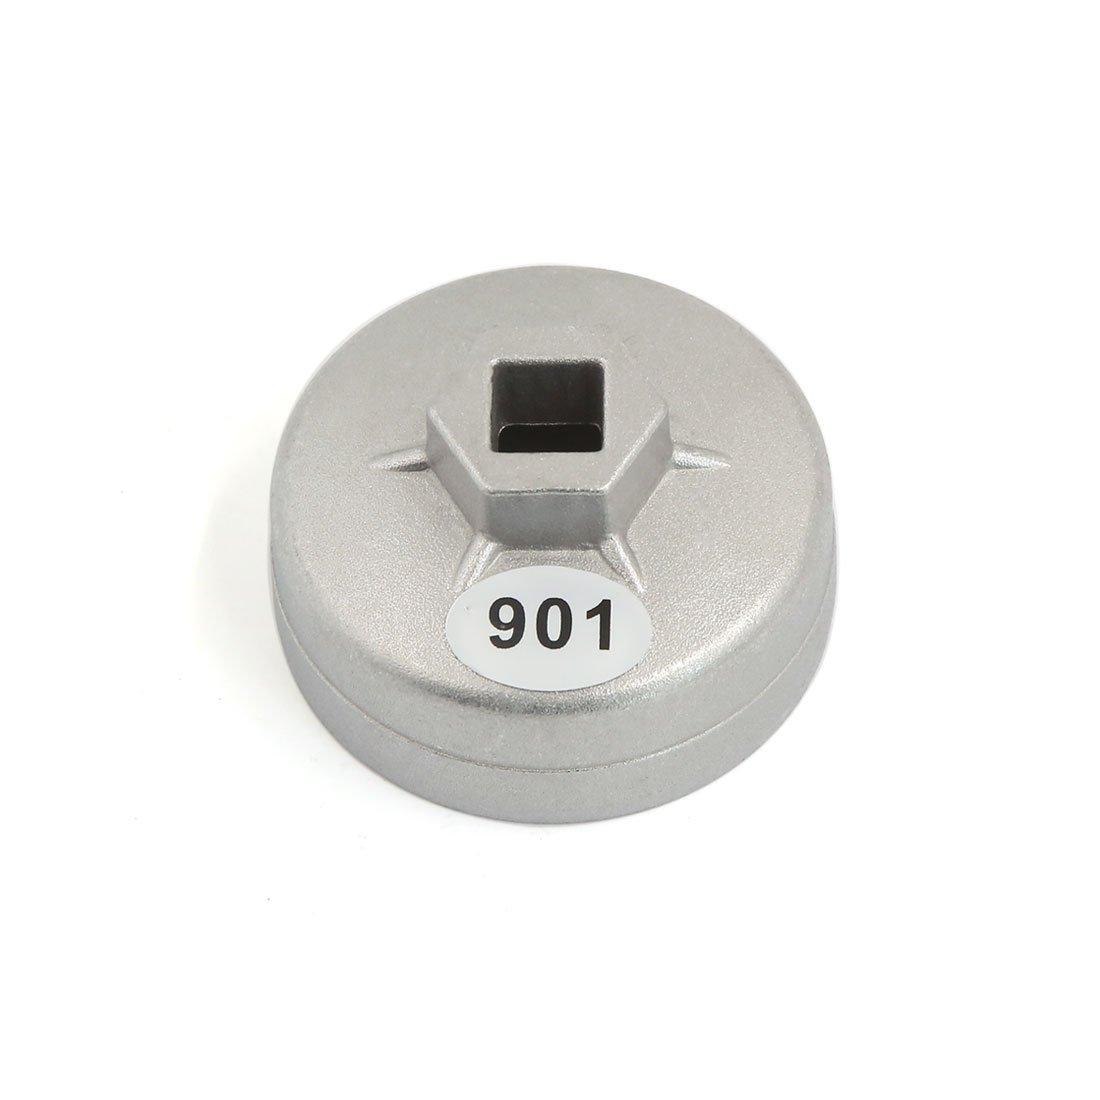 Sourcingmap® 13mm quadrato 14scanalature 65mm Drive tappo filtro olio chiave auto Tool sourcing map a16041800ux1244